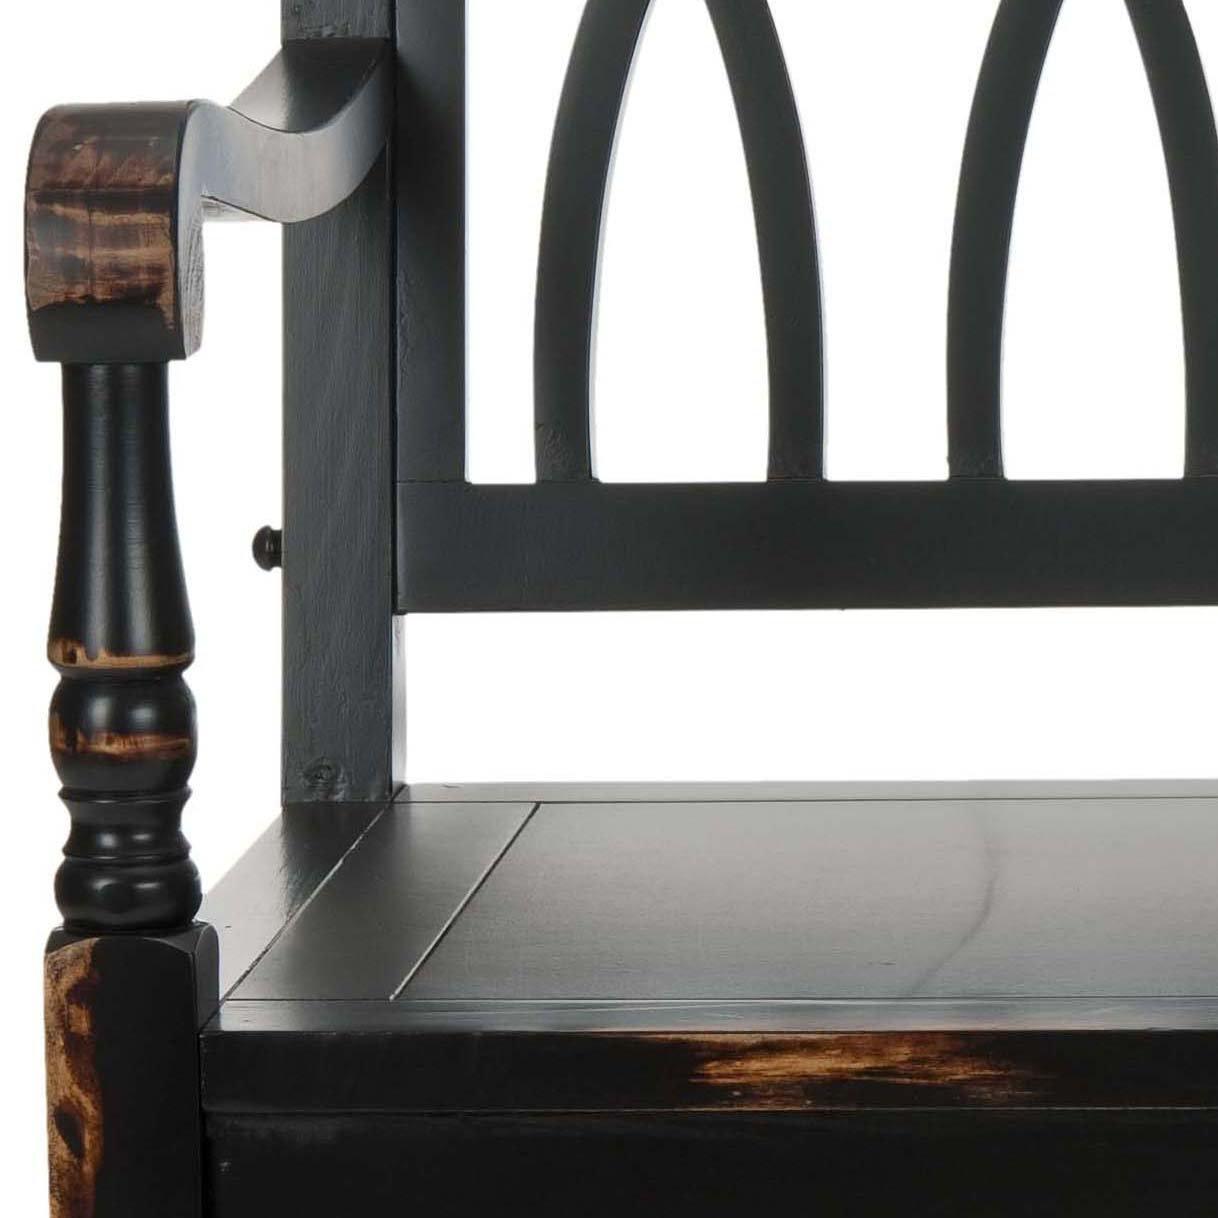 Safavieh American Homes Collection Benjamin Distressed Black Bench